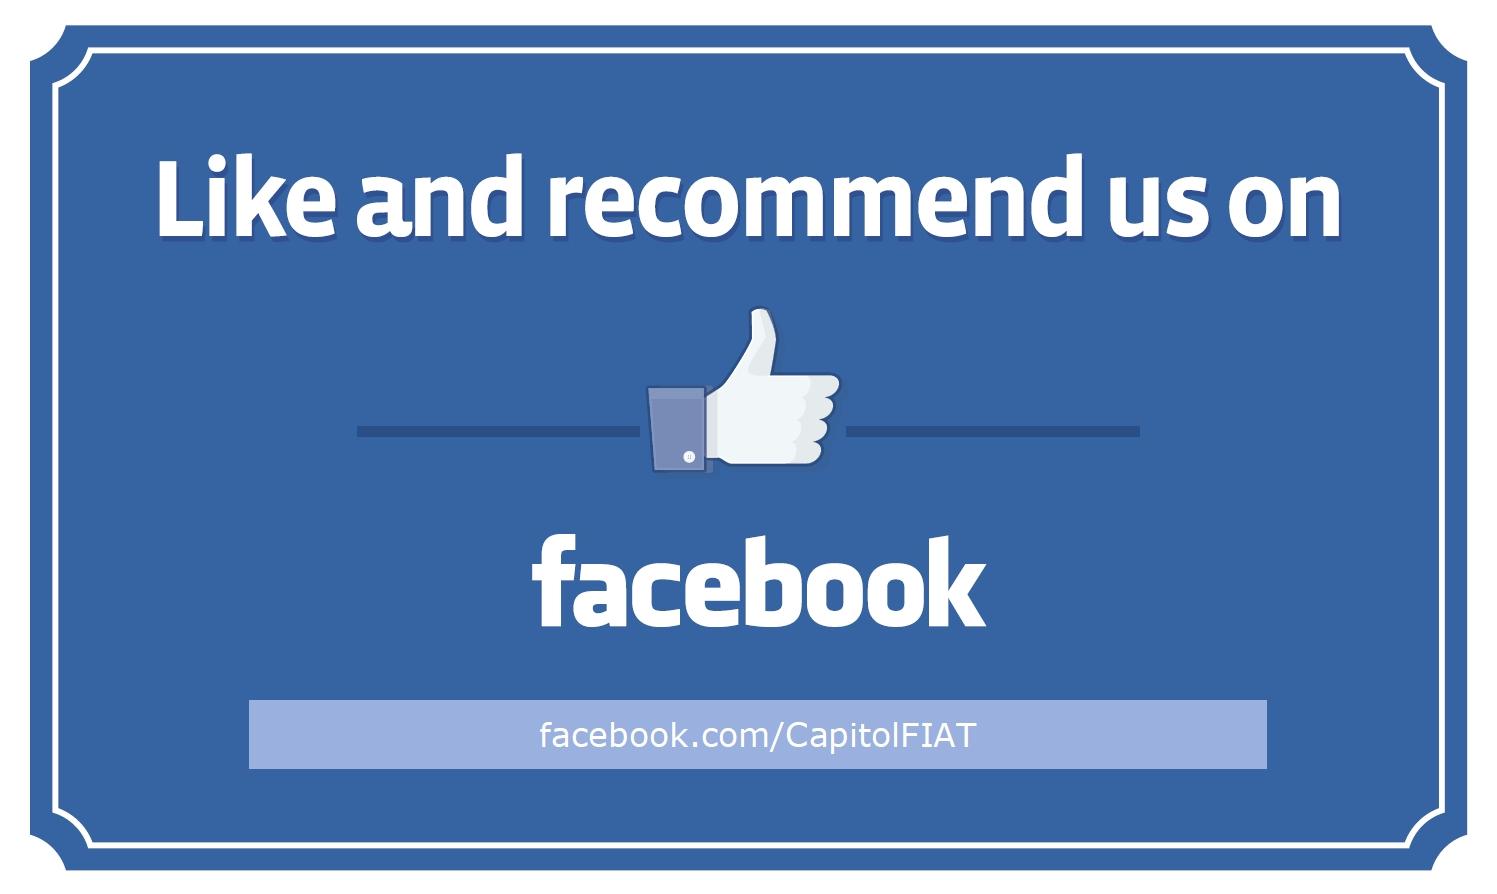 free facebook window stickers satu sticker. Black Bedroom Furniture Sets. Home Design Ideas